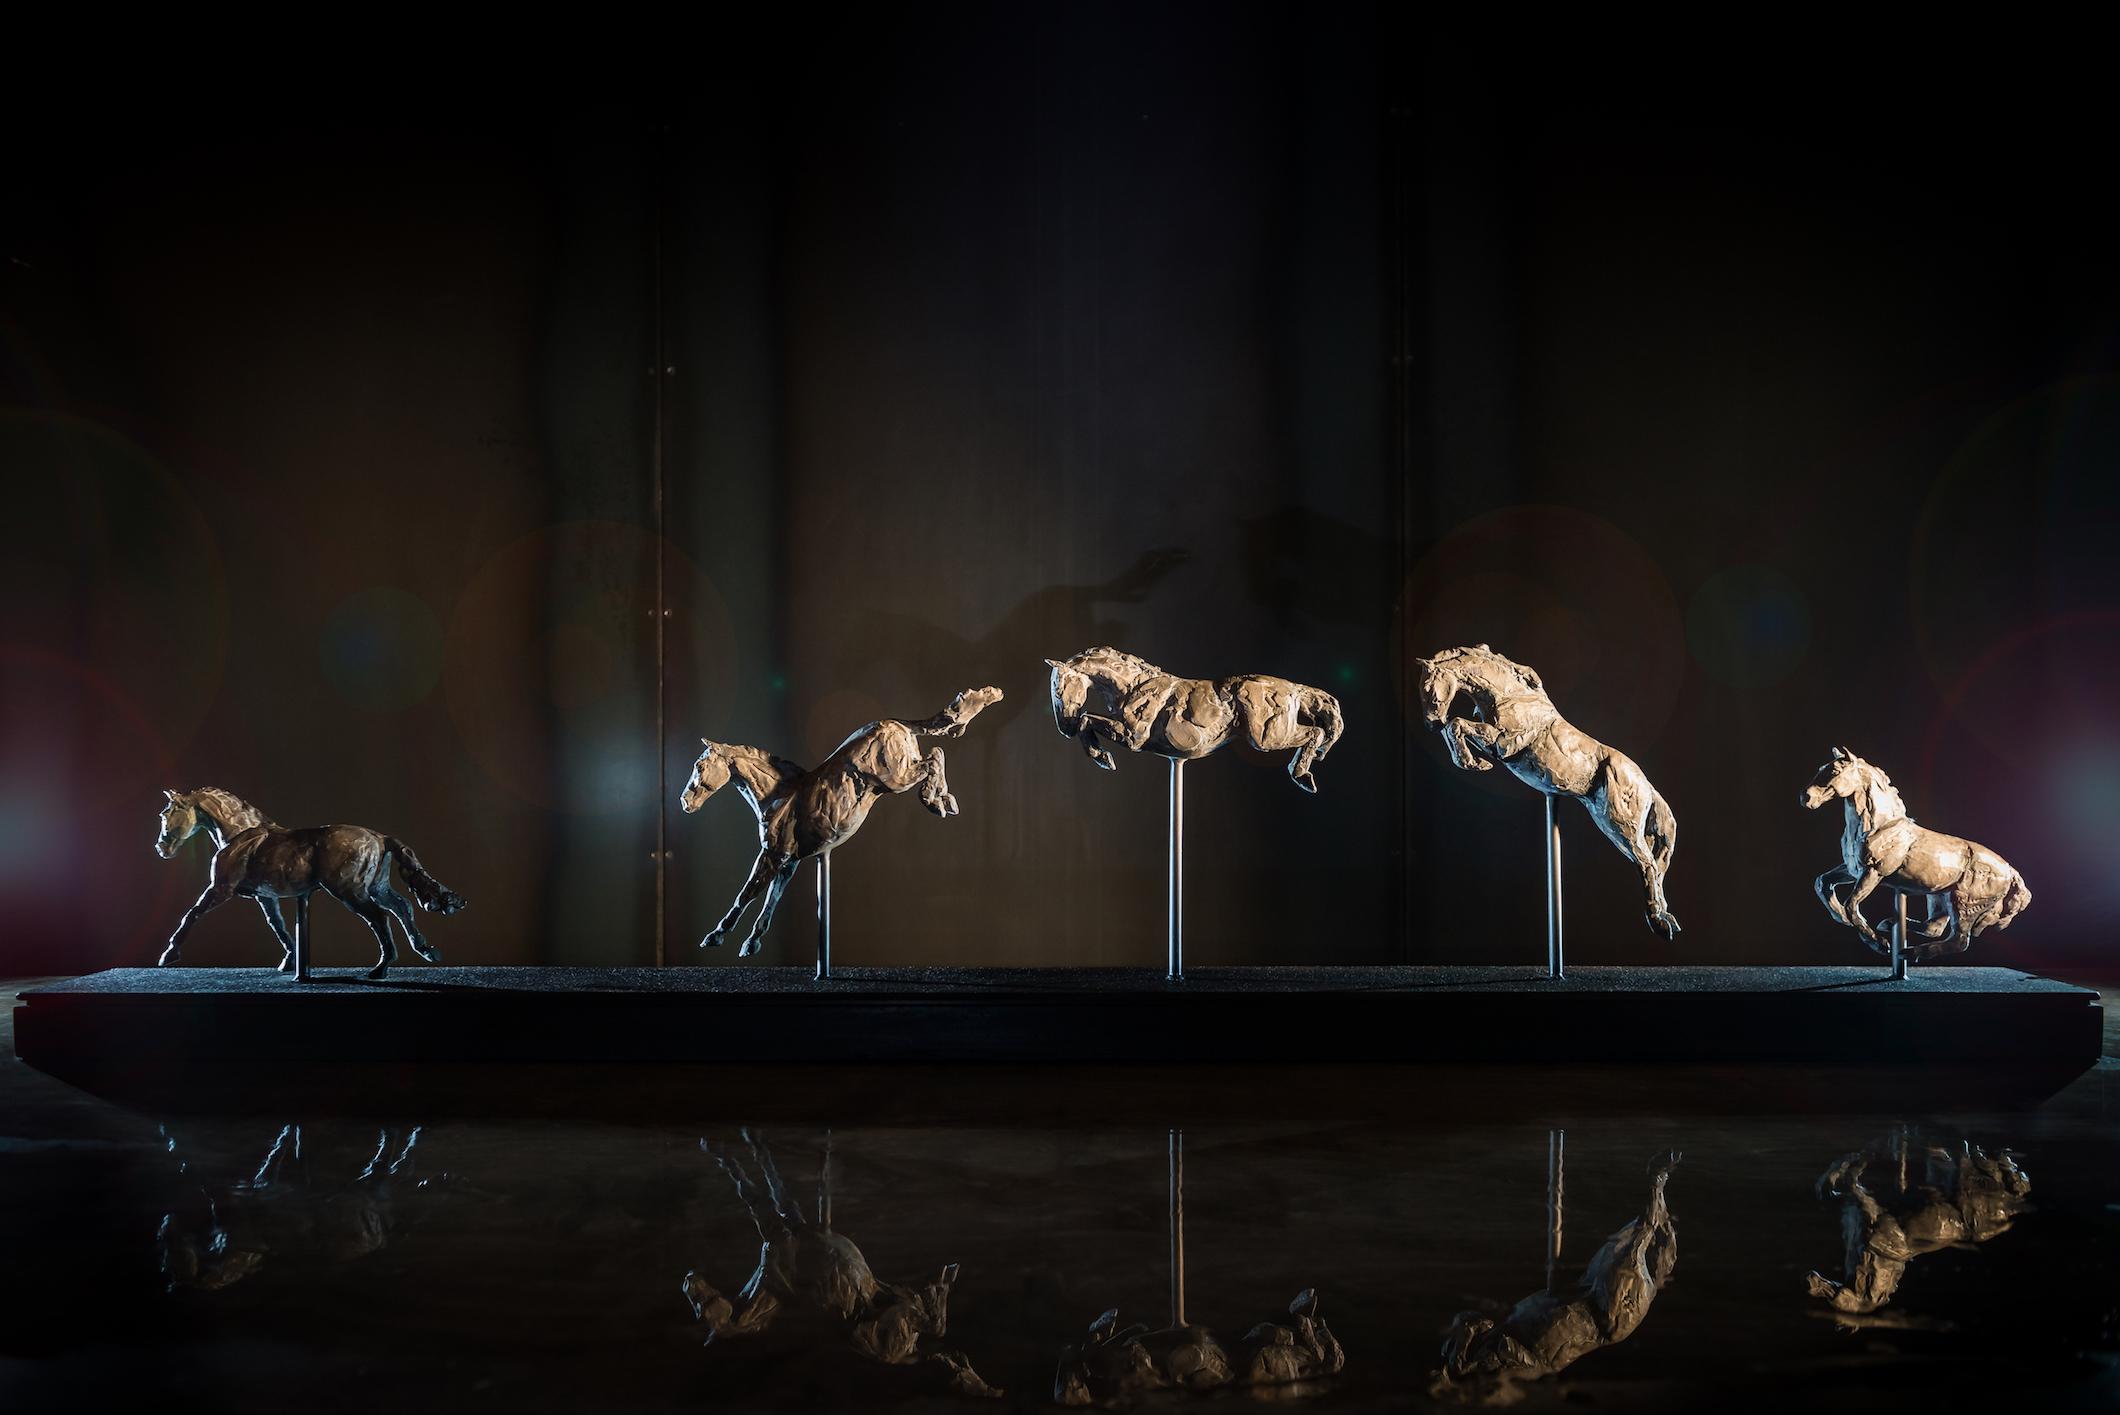 Bascule by  Stephanie Revennaugh - Masterpiece Online